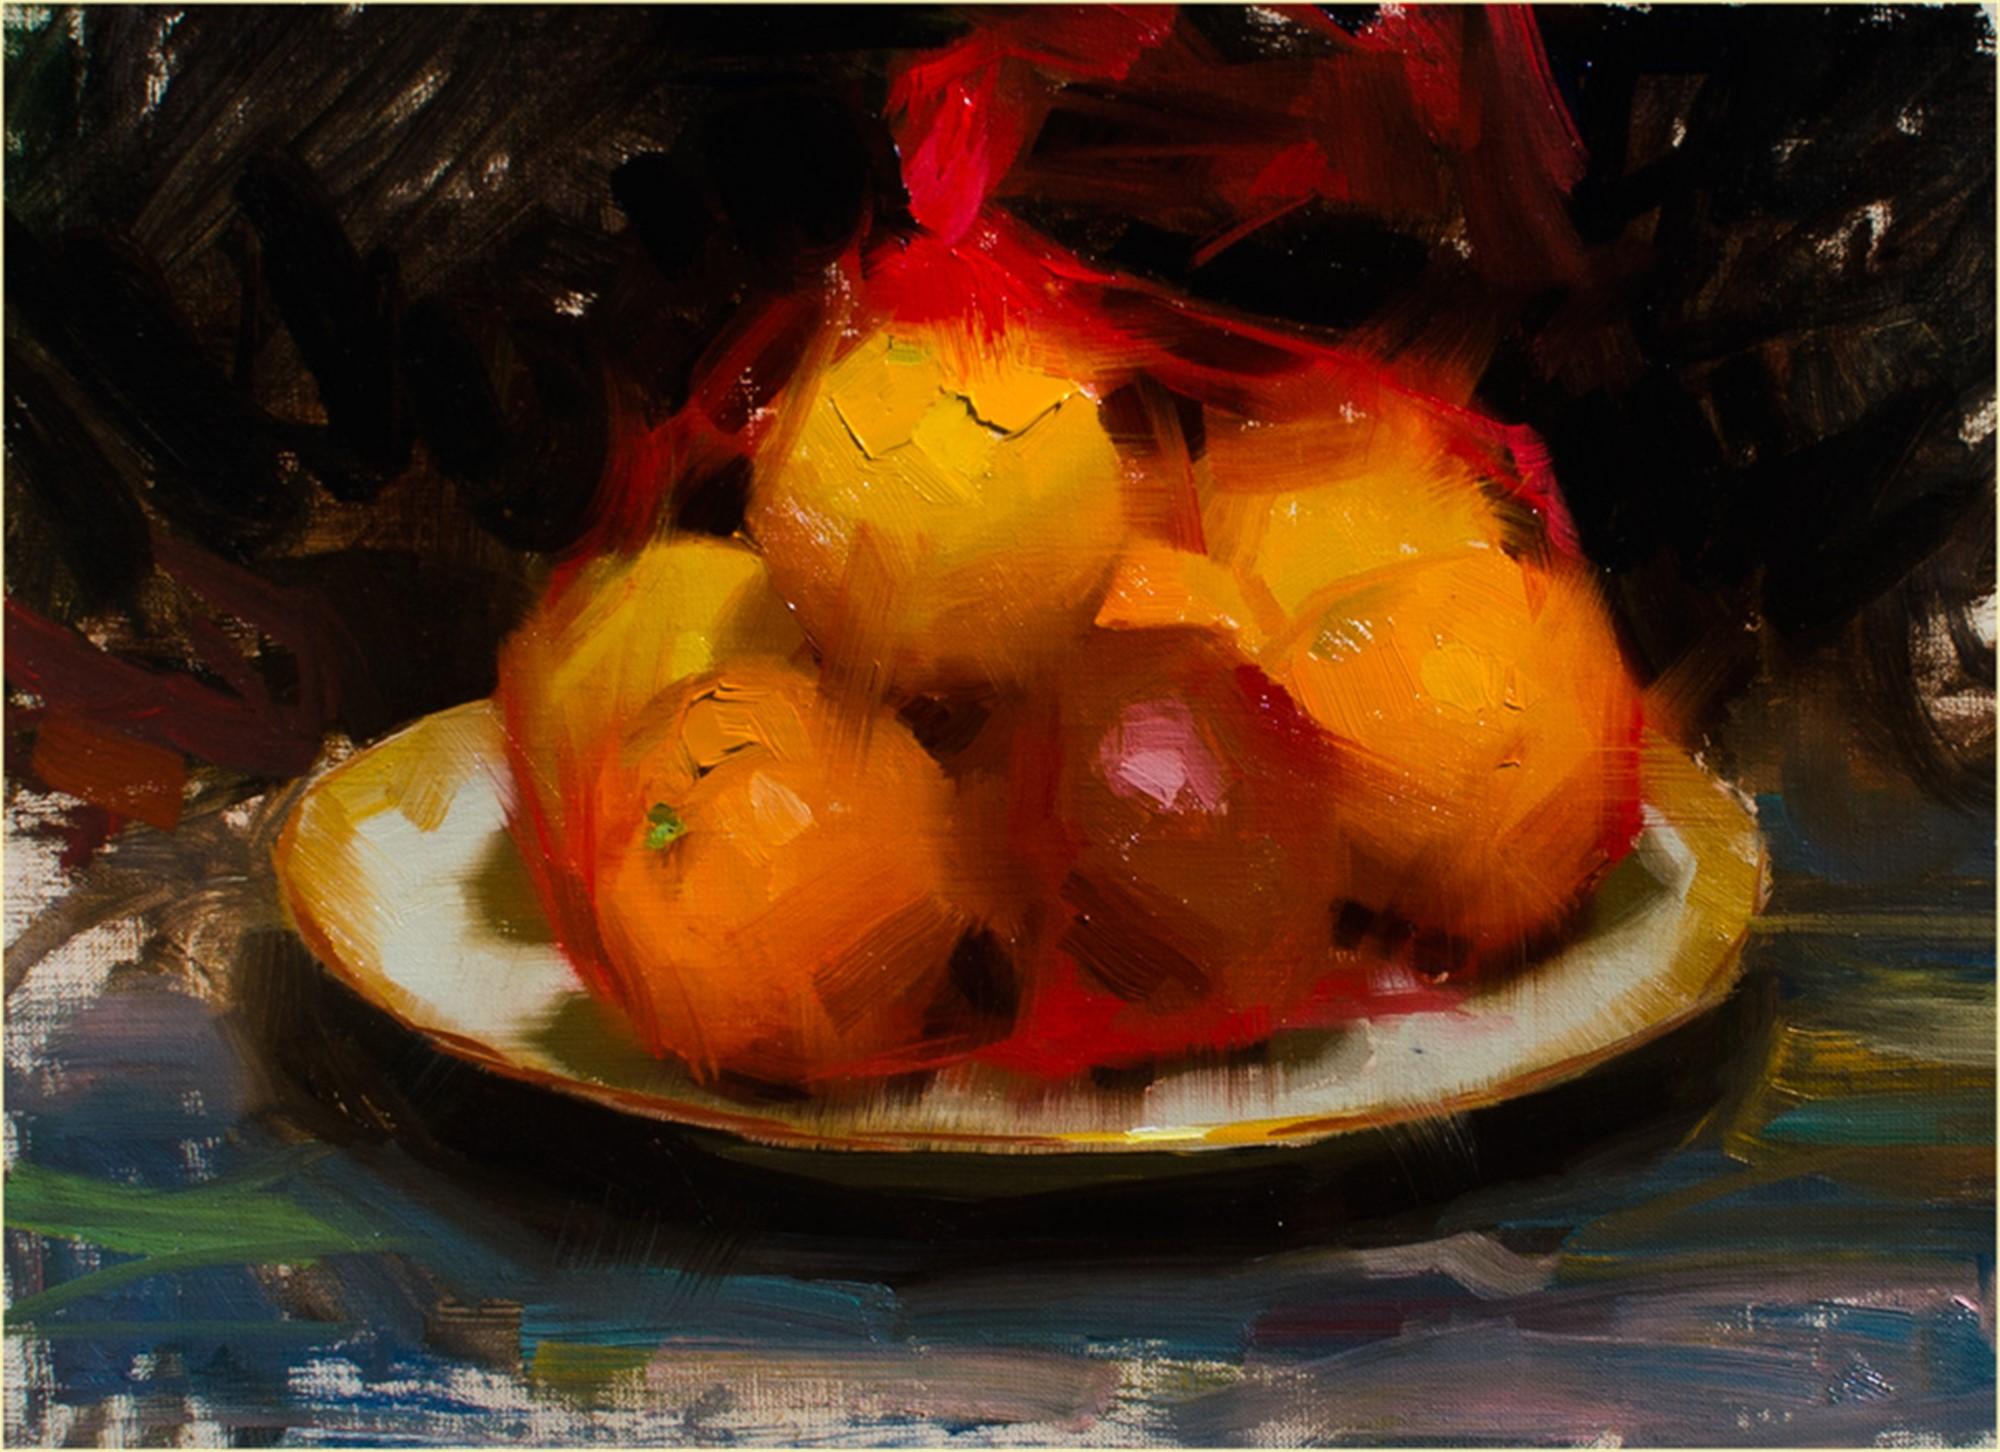 A Study of Citrus by Daniel Keys